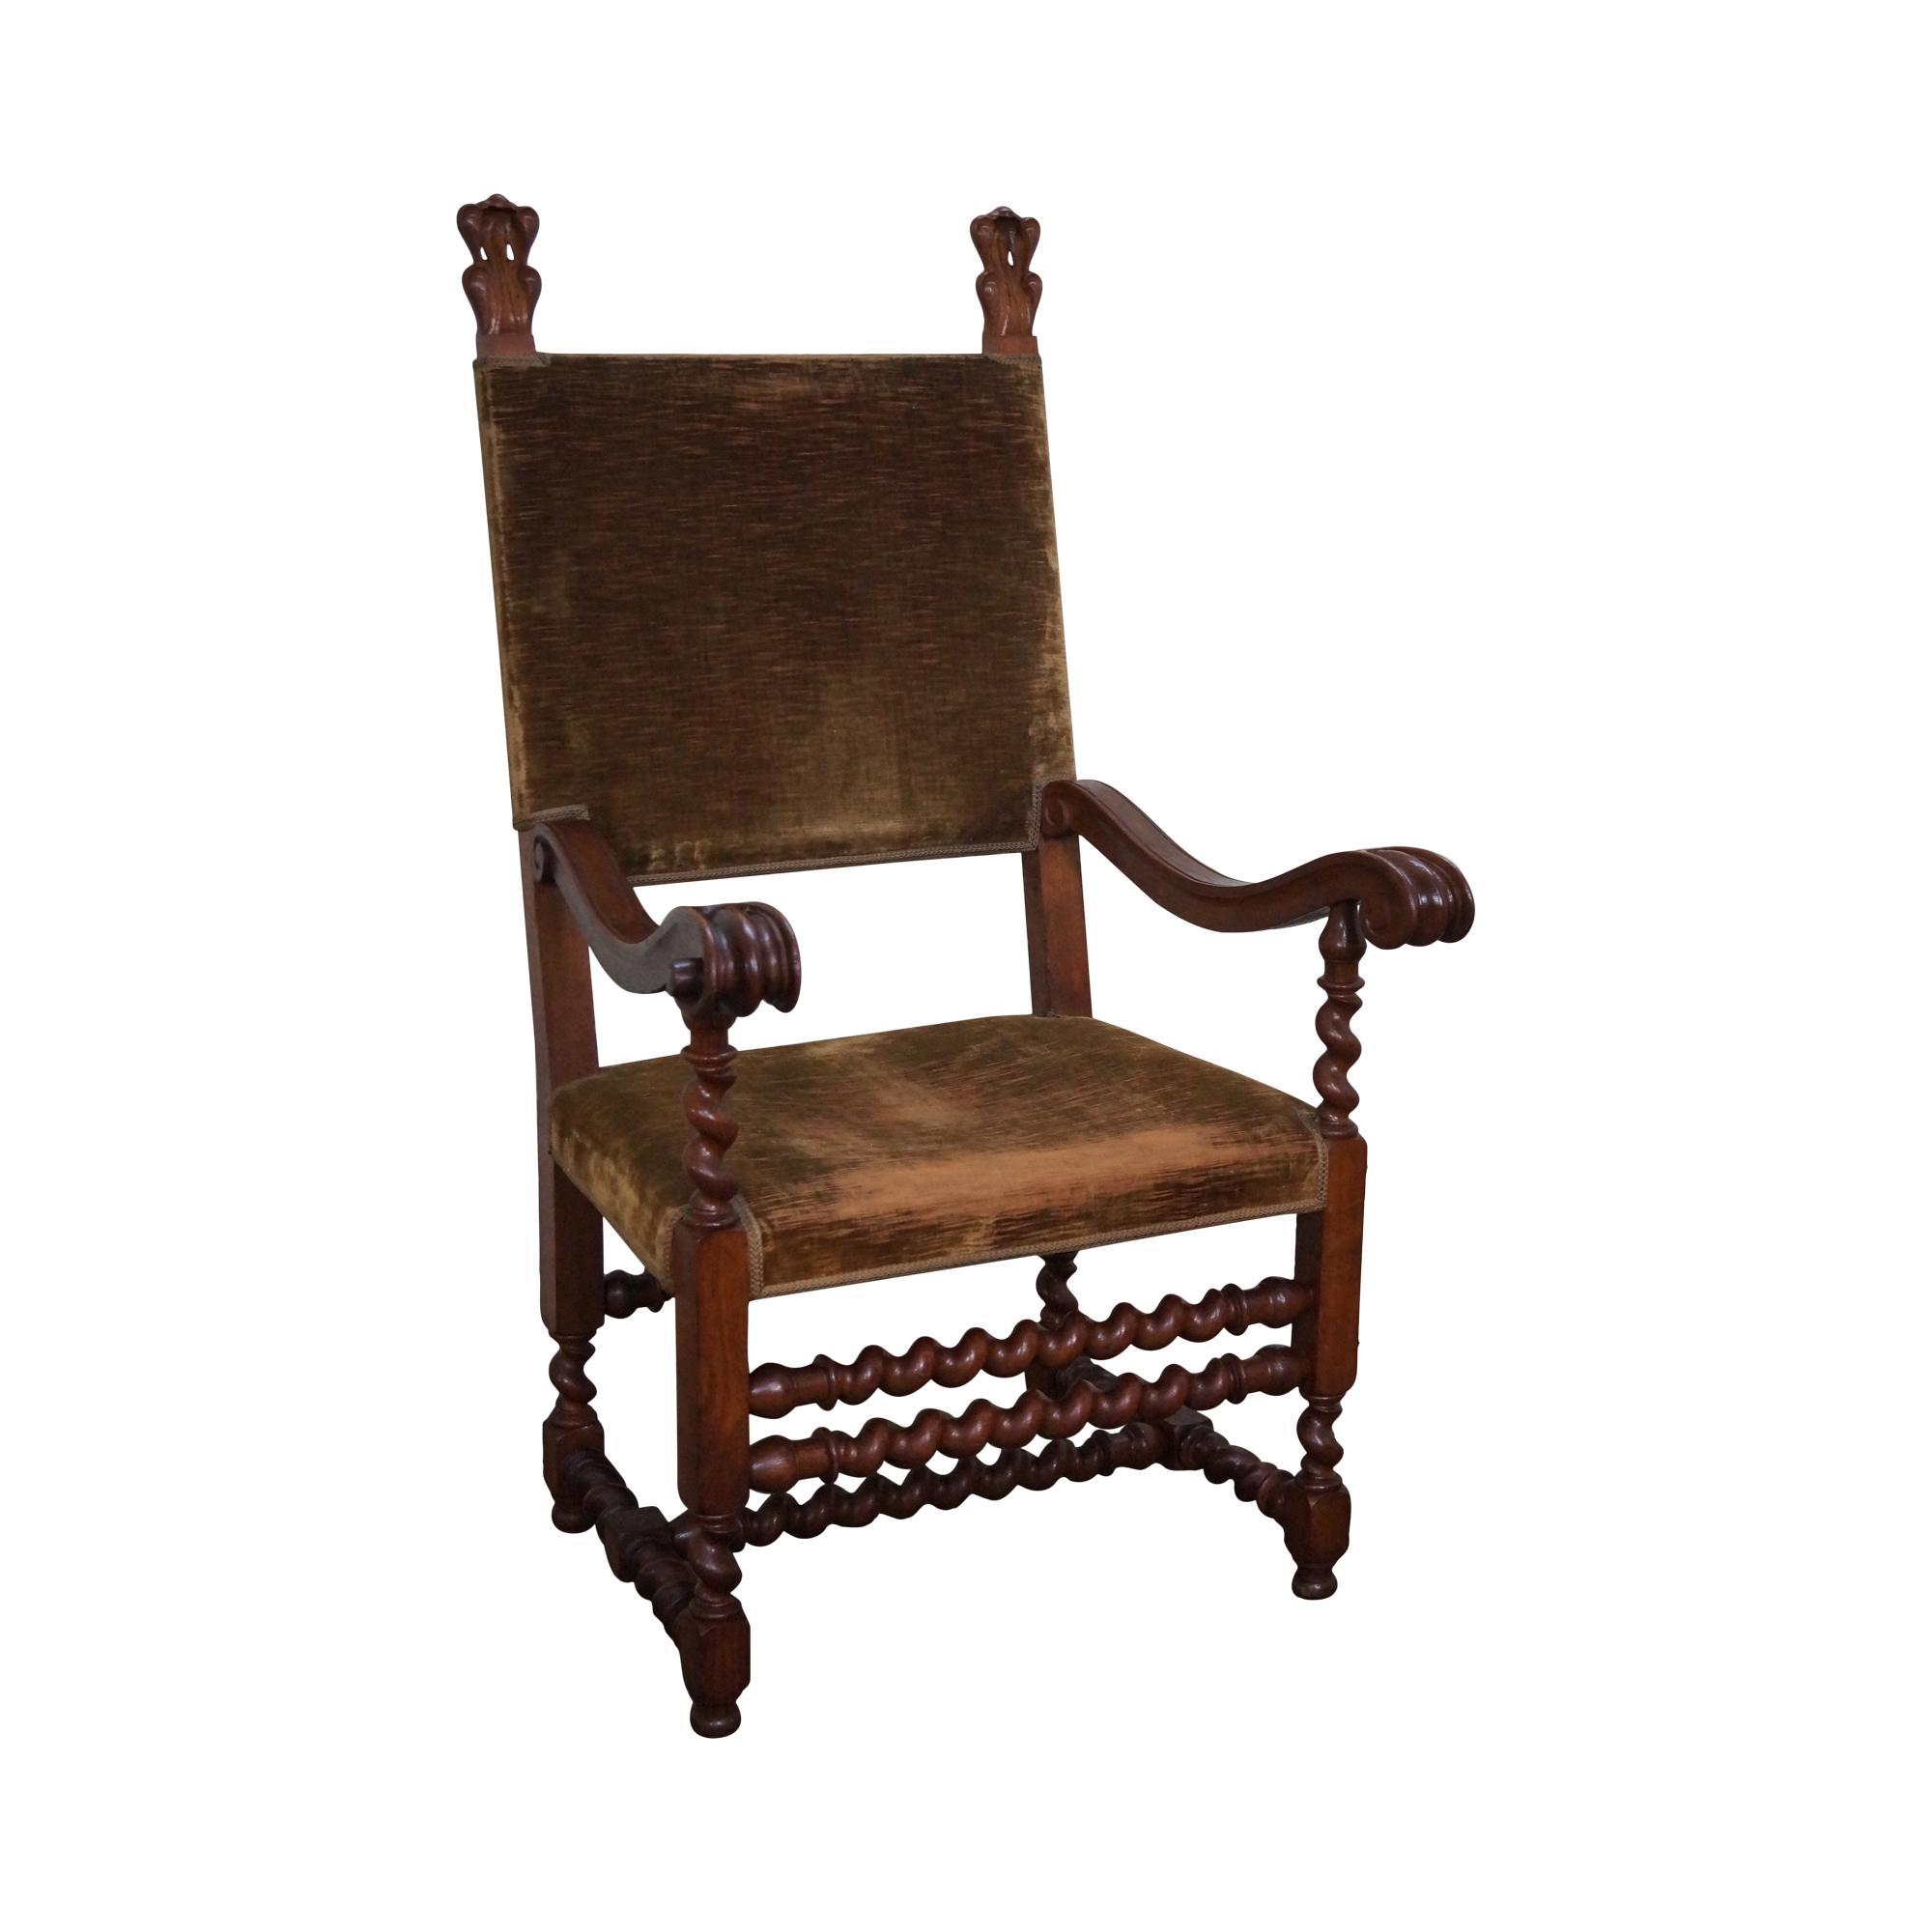 Antique 19th C. Renaissance Revival Barley Twist Throne ...